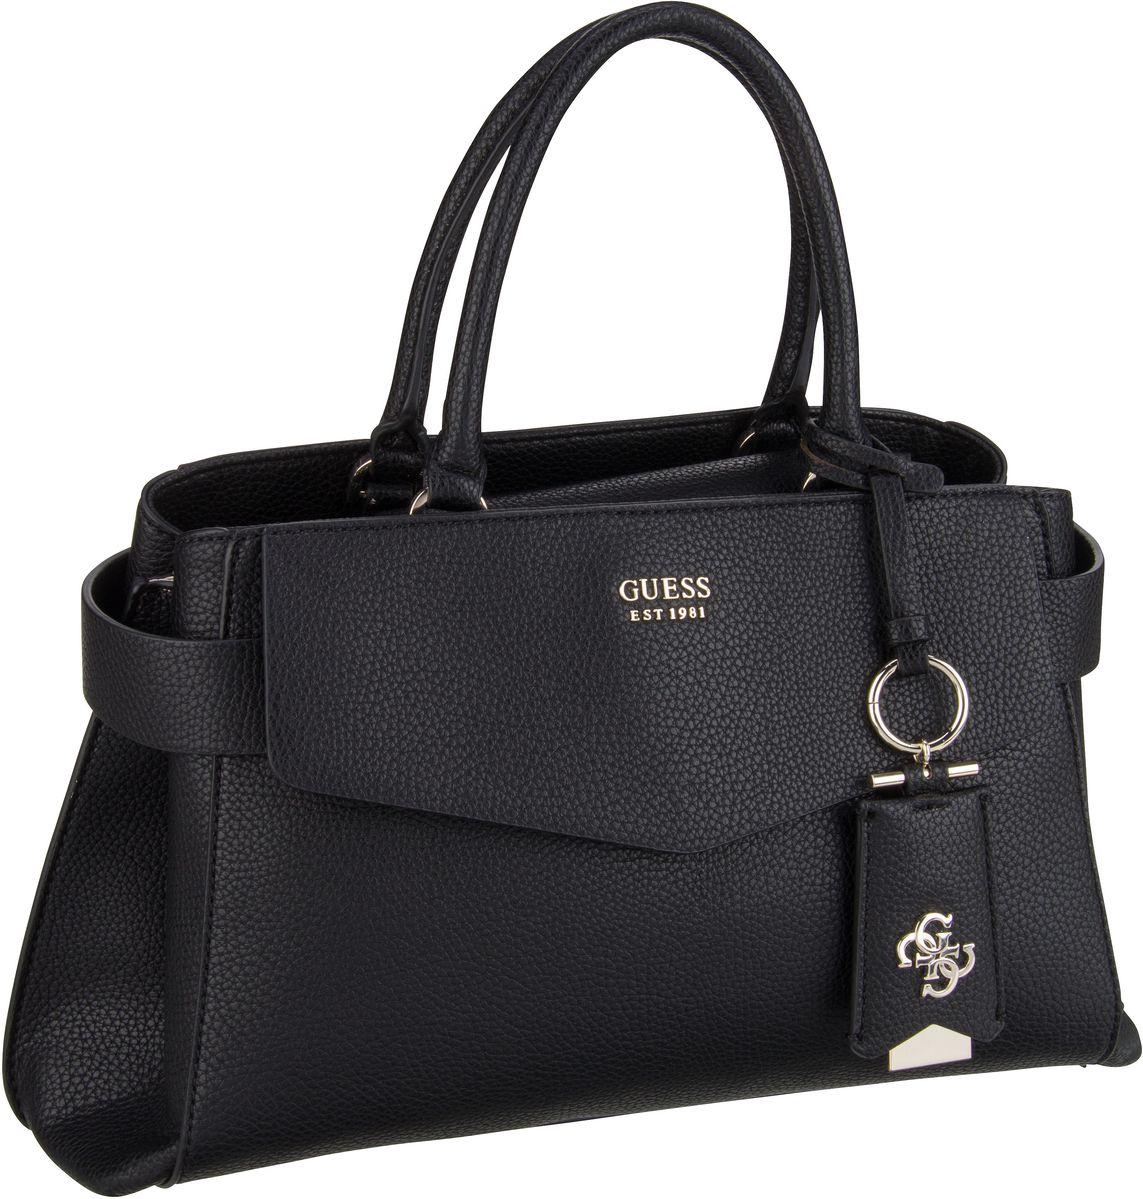 Handtasche Colette Girlfriend Satchel Black